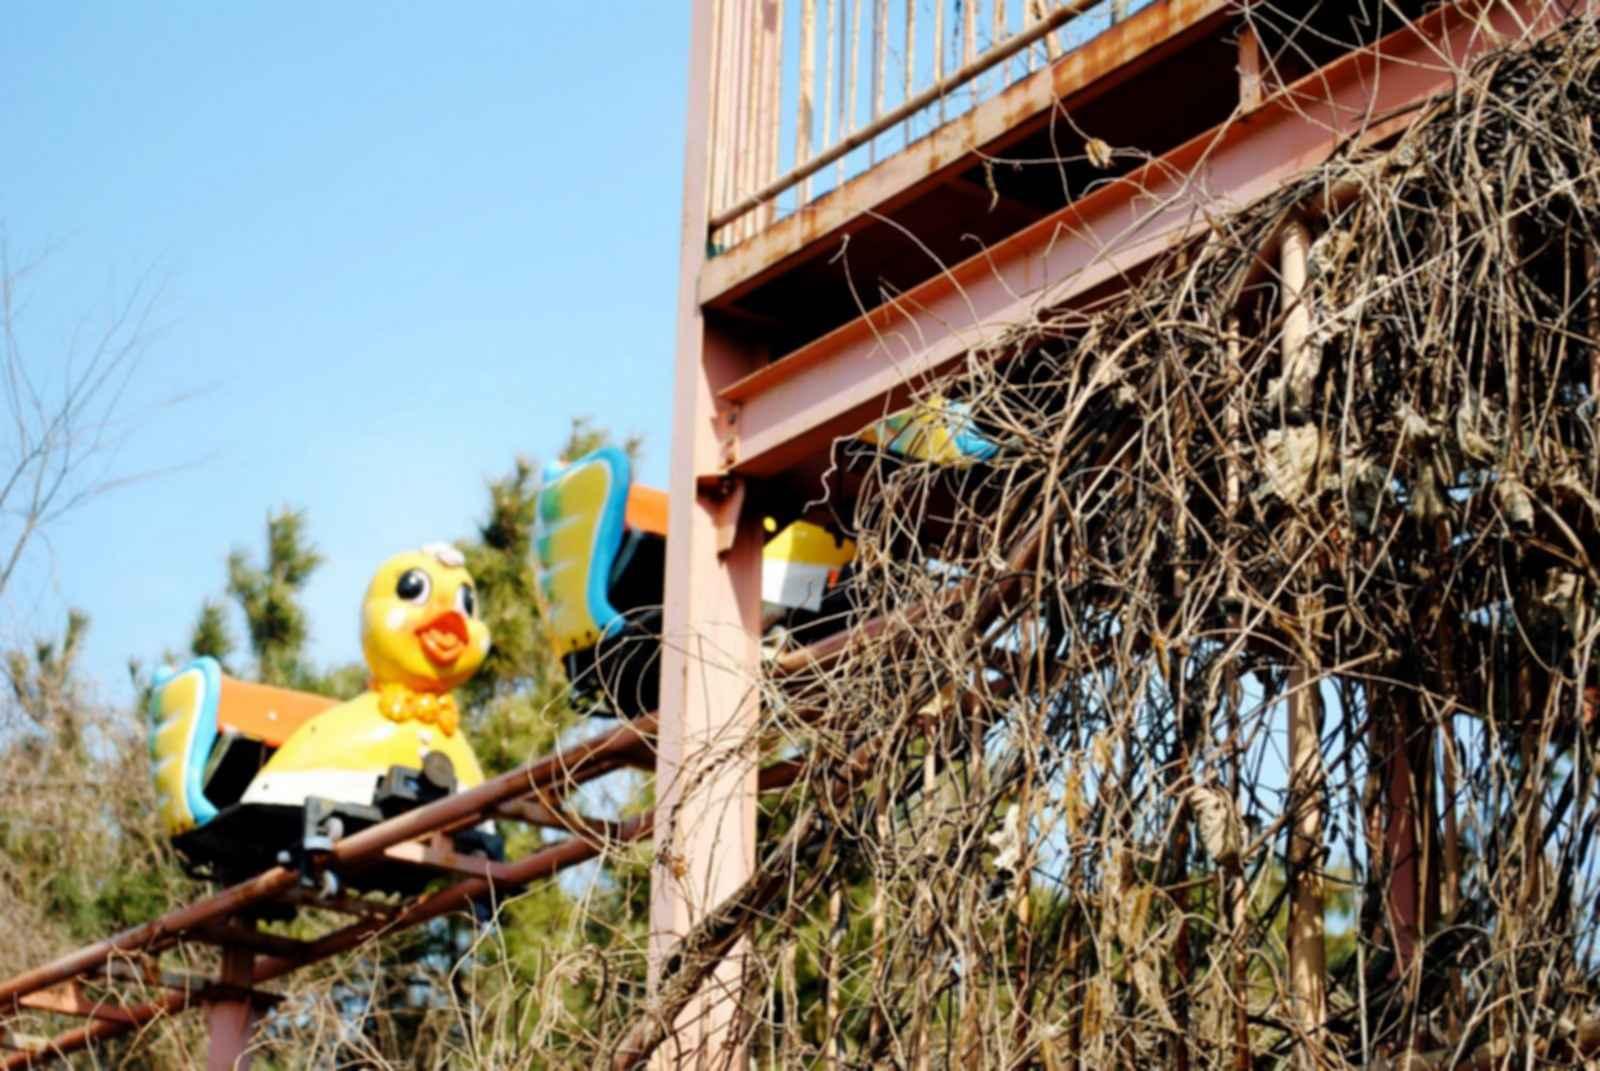 Okpo Land Amusement Park - Run-down ride